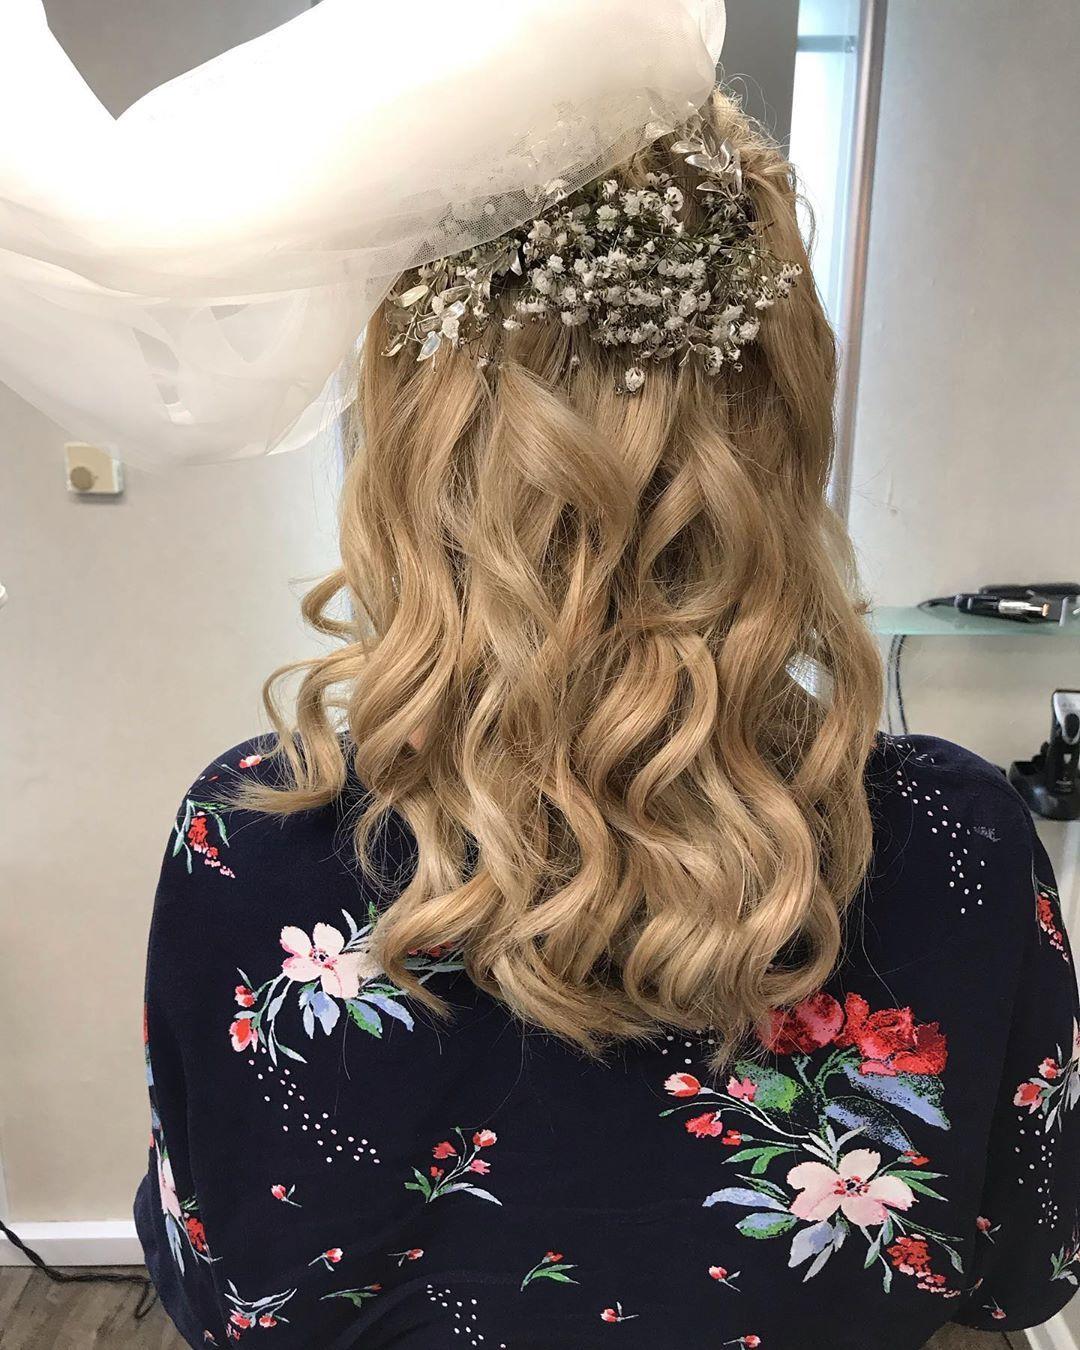 Hairstyling Style Beauty Hochstecken Hochsteckfrisur Hochzeit Hochzeitsfrisur Brautfrisur Braut Maluhairways Fri Long Hair Styles Hair Styles Beauty